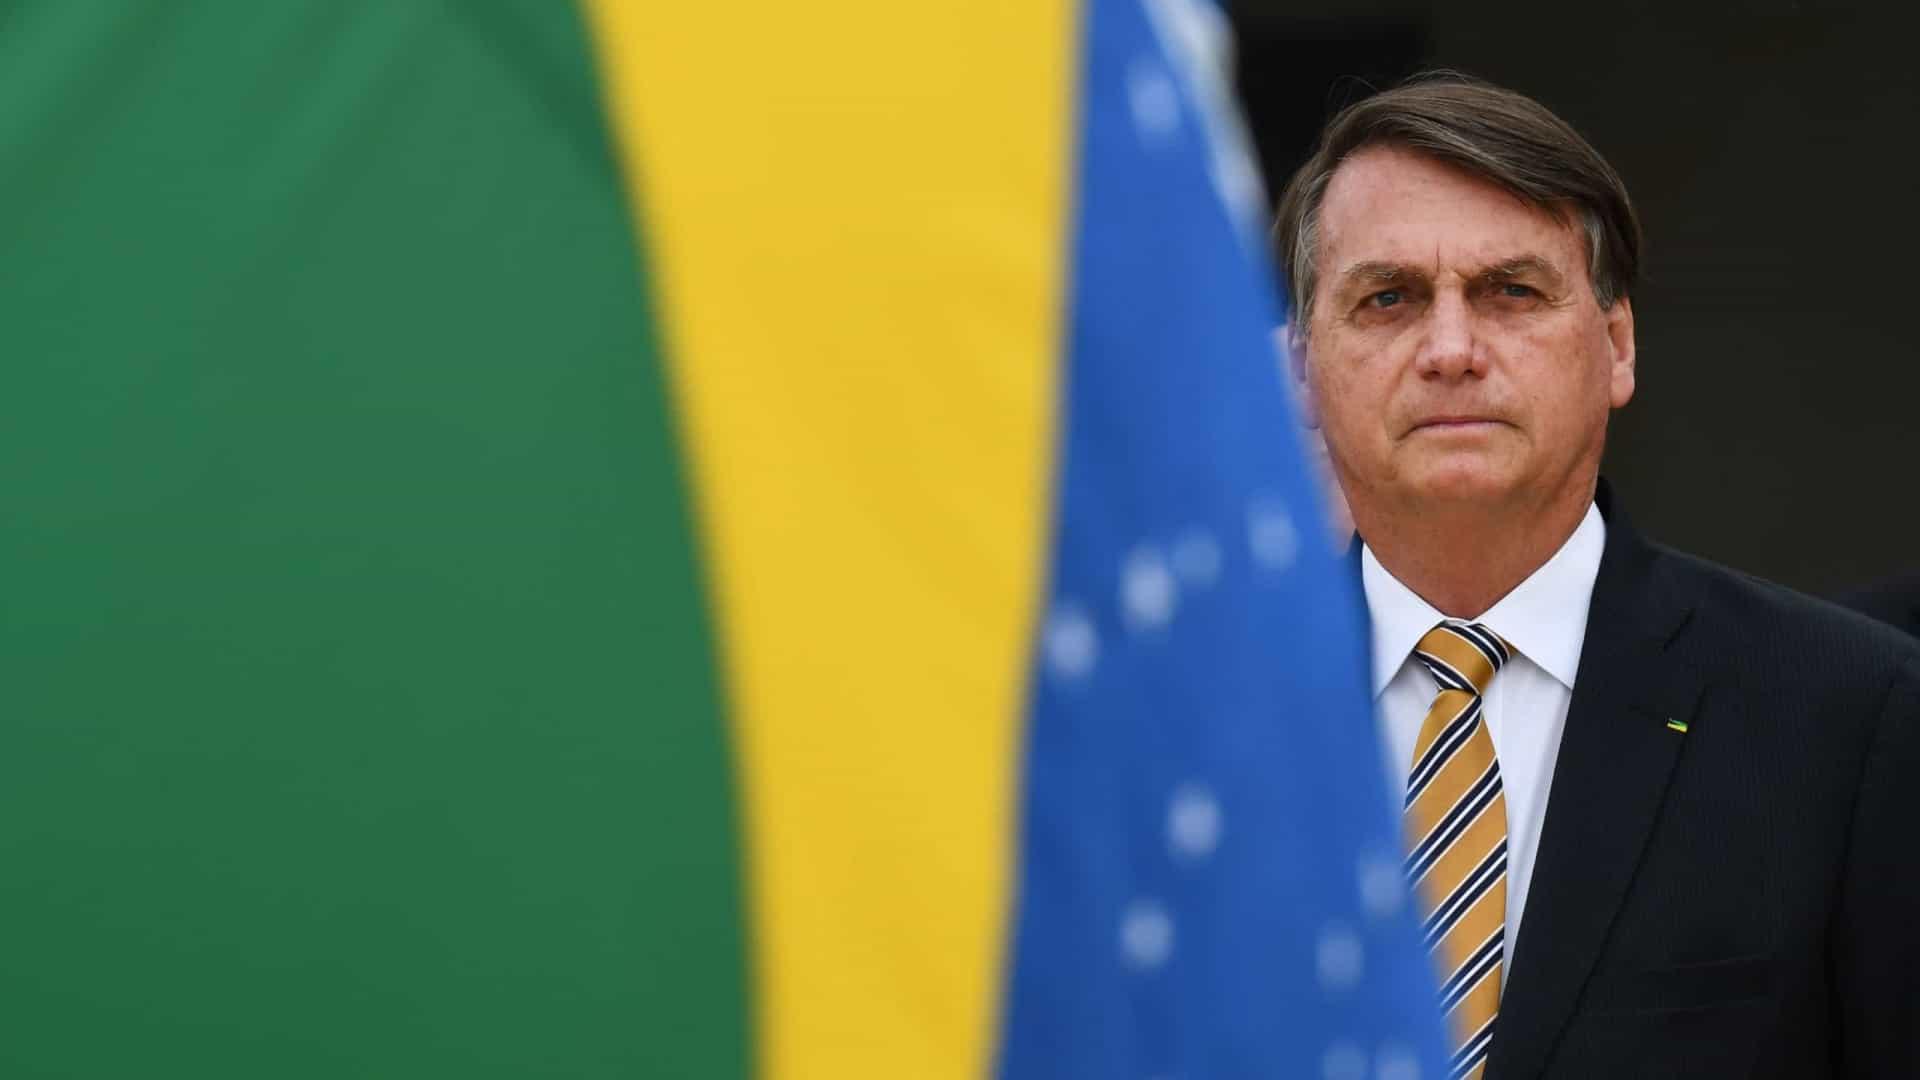 bolsonaro 1 - Bolsonaro faz pronunciamento e live nesta véspera de Natal